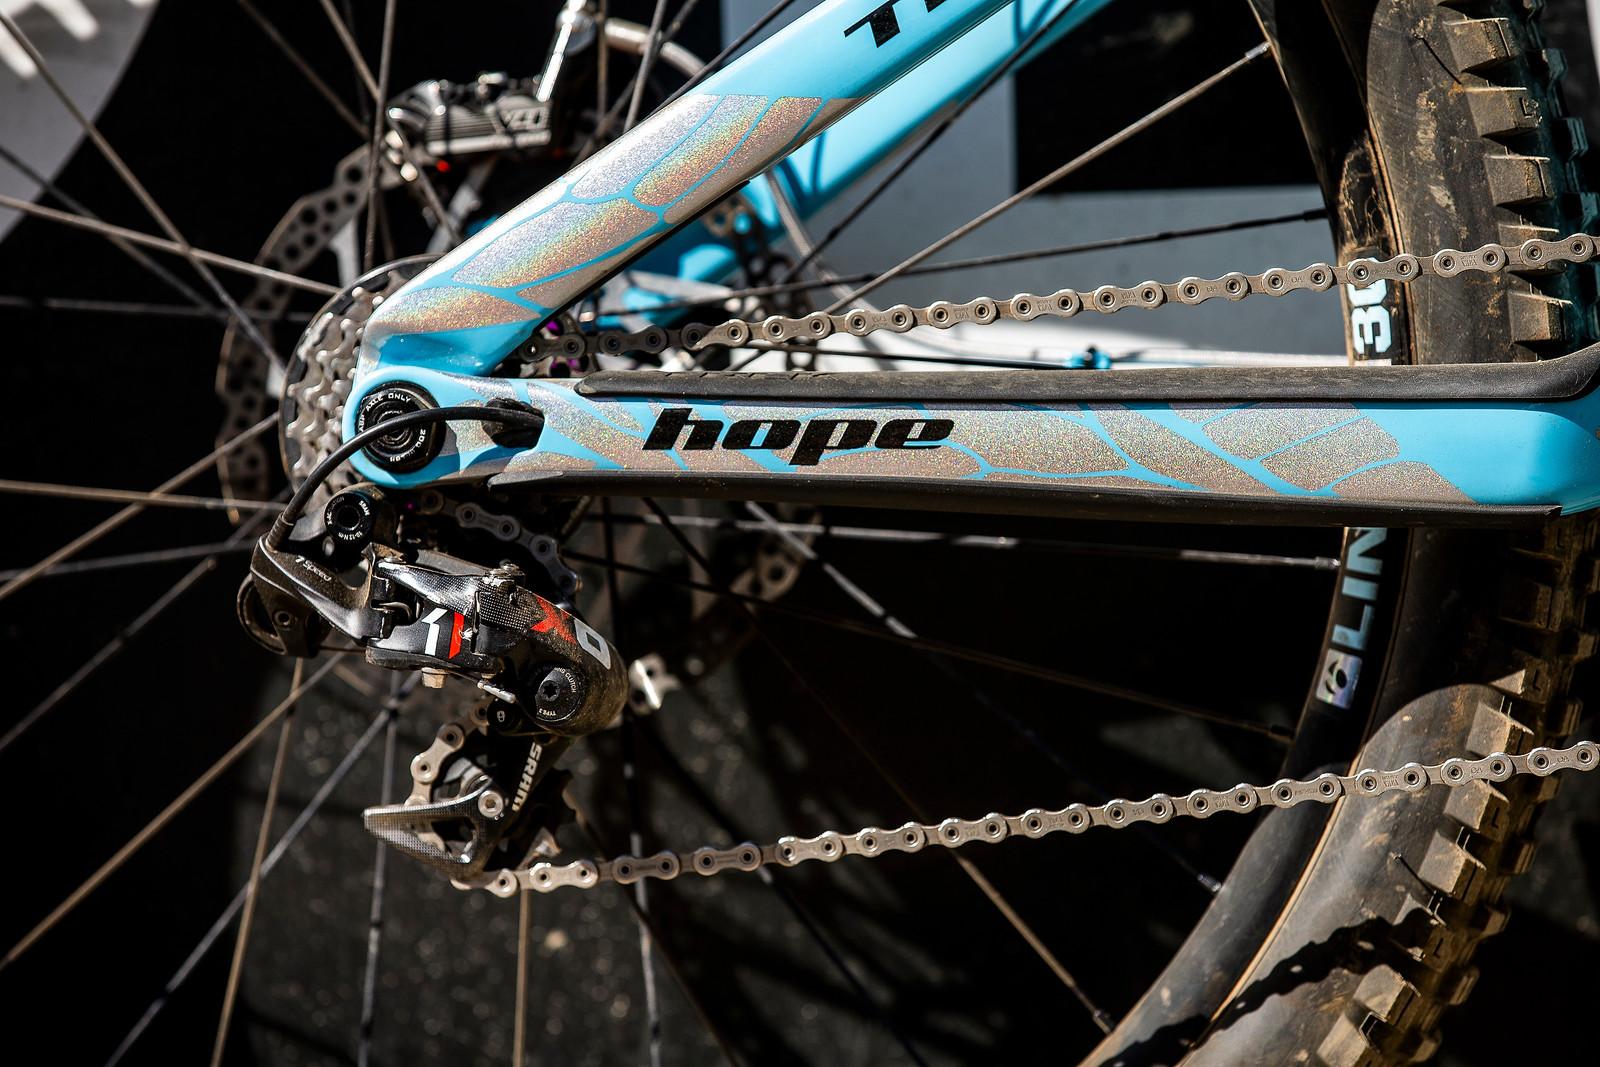 SRAM X0 DH Drivetrain - WINNING BIKE - Rachel Atherton's Trek Session - Mountain Biking Pictures - Vital MTB